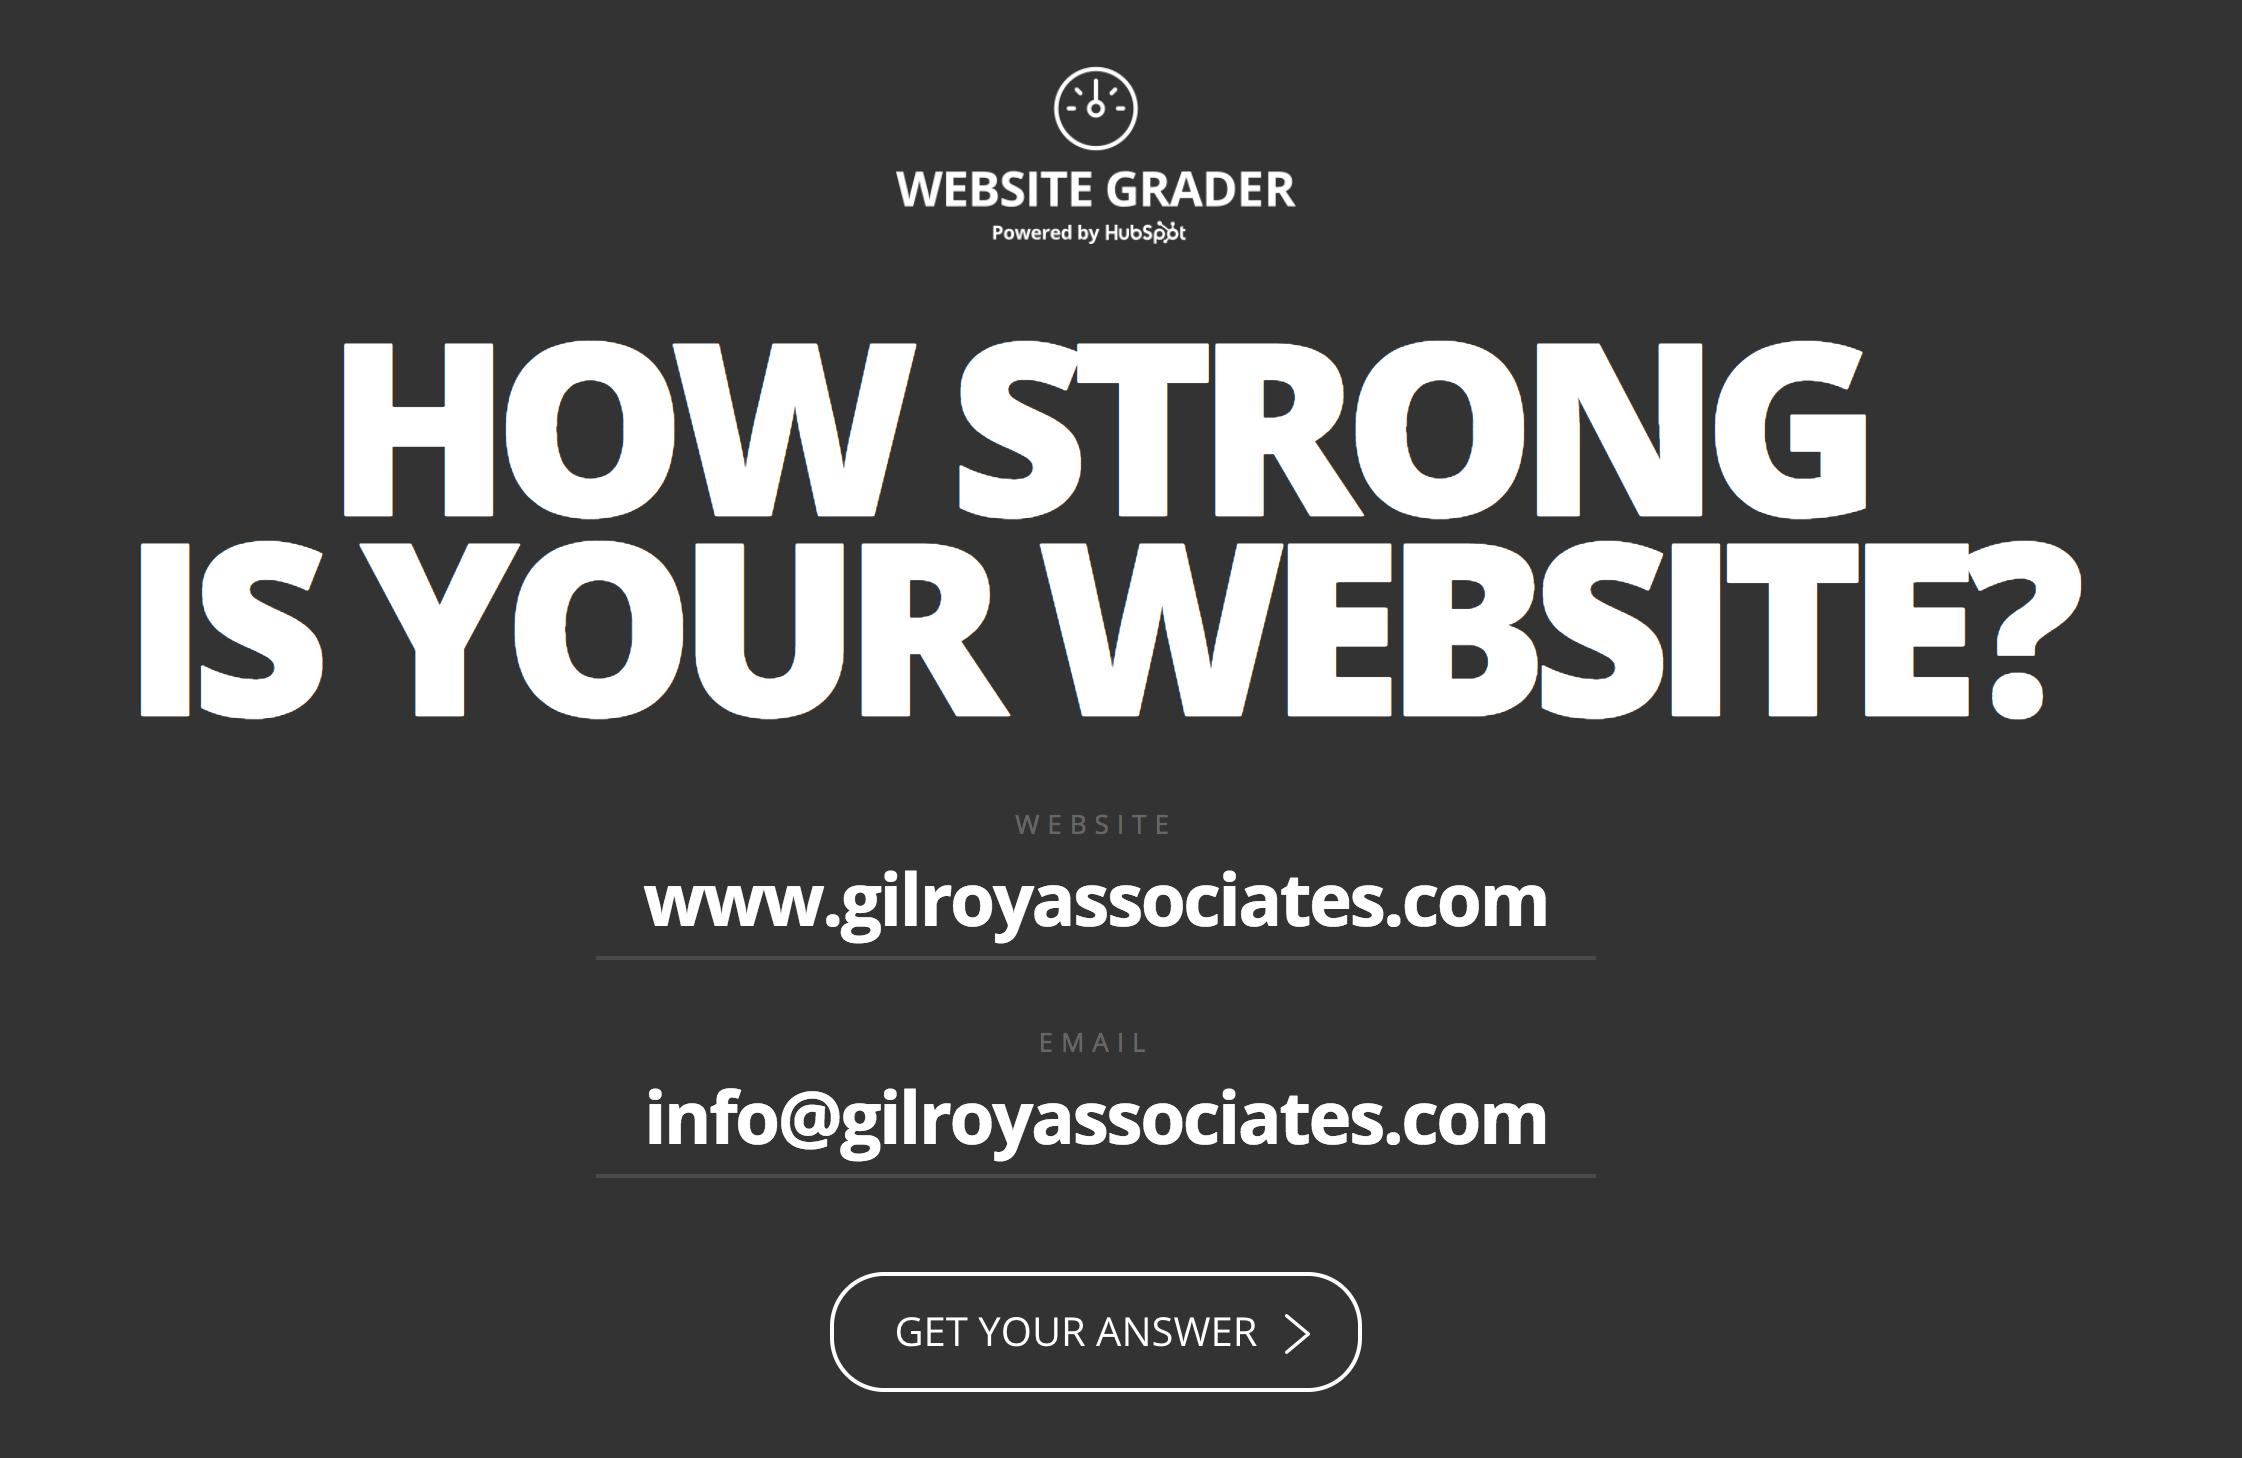 Website Grader - Gilroy Associates